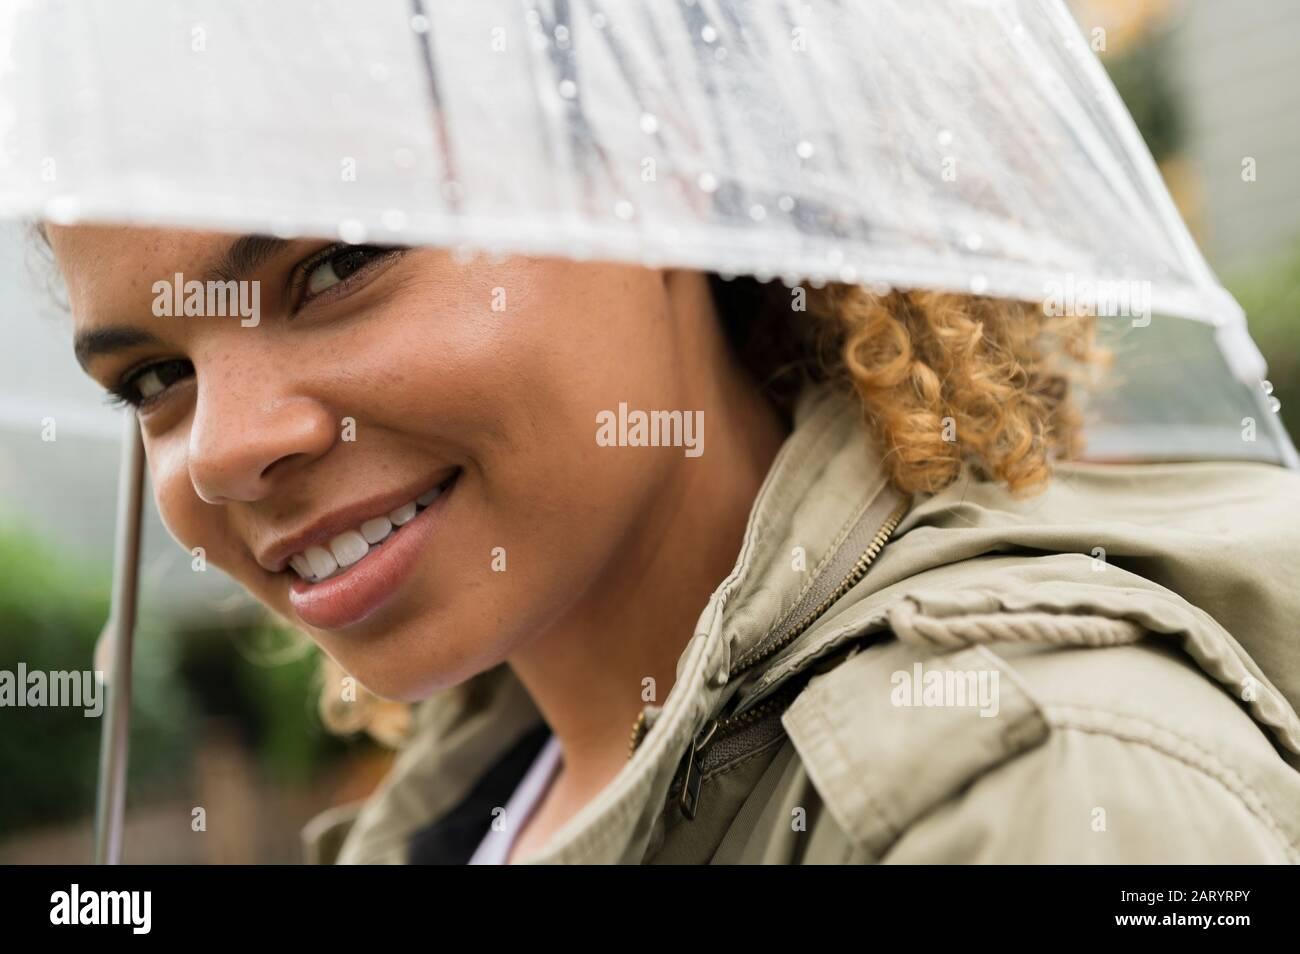 Smiling woman under wet umbrella Stock Photo